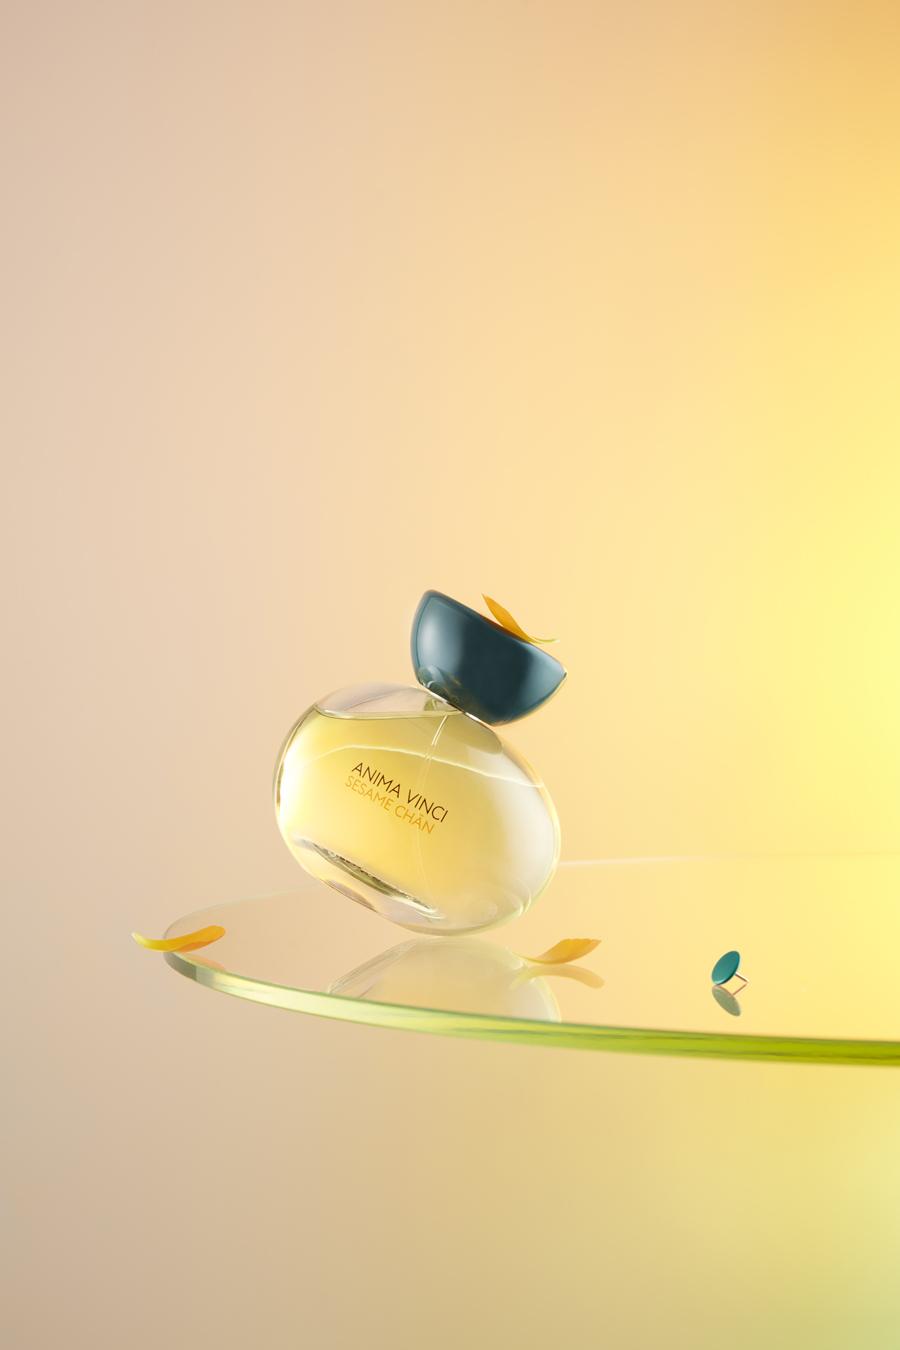 Sesame Chan by anima vici perfume